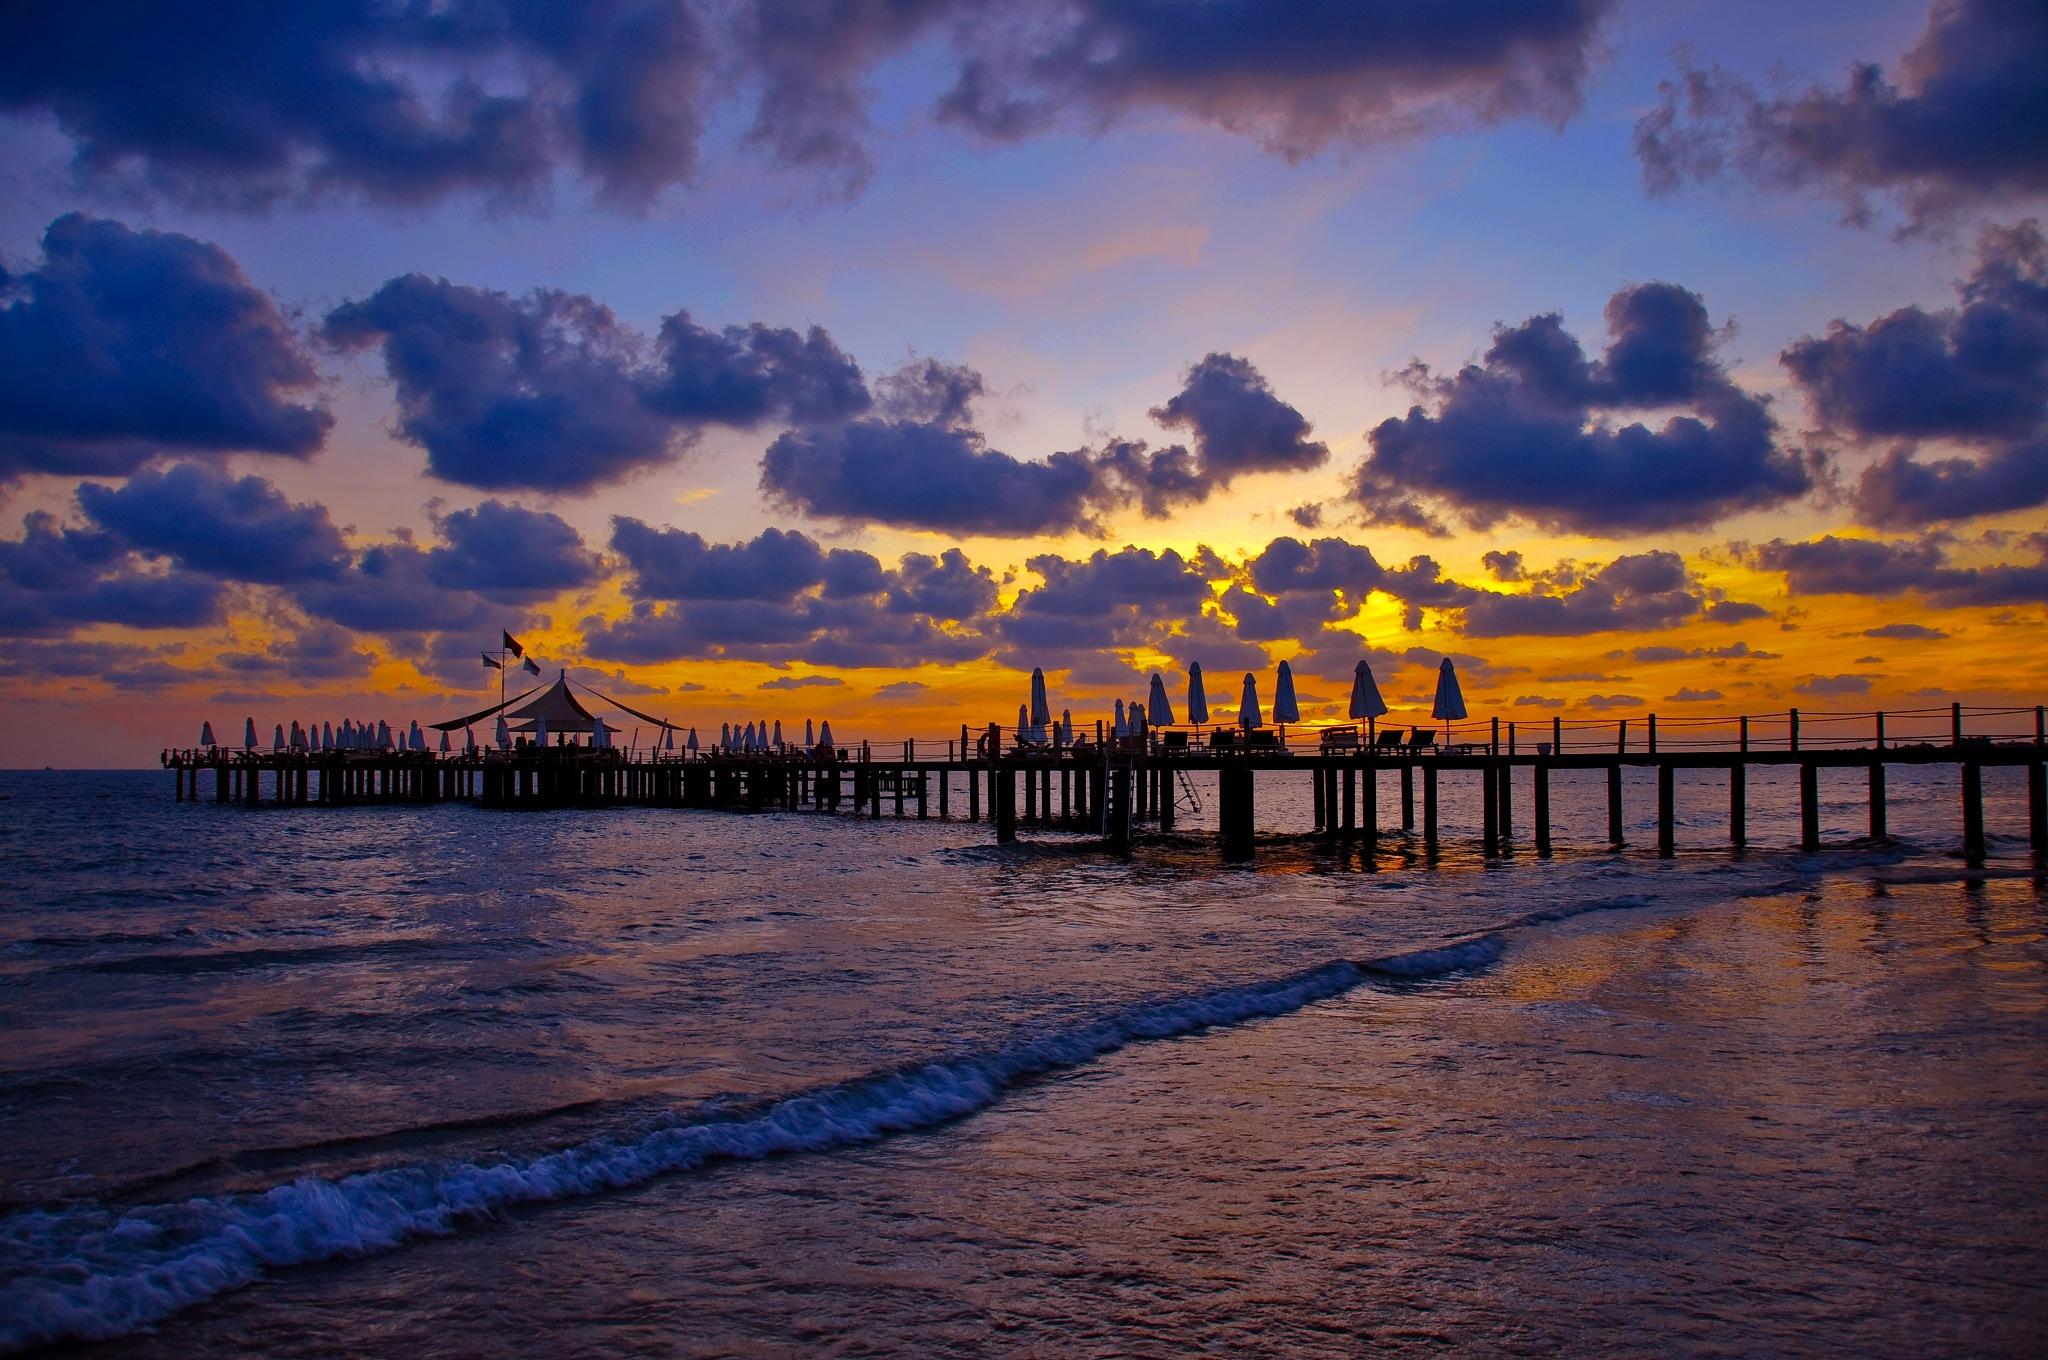 Side sunset by Ermedin Islamcevic